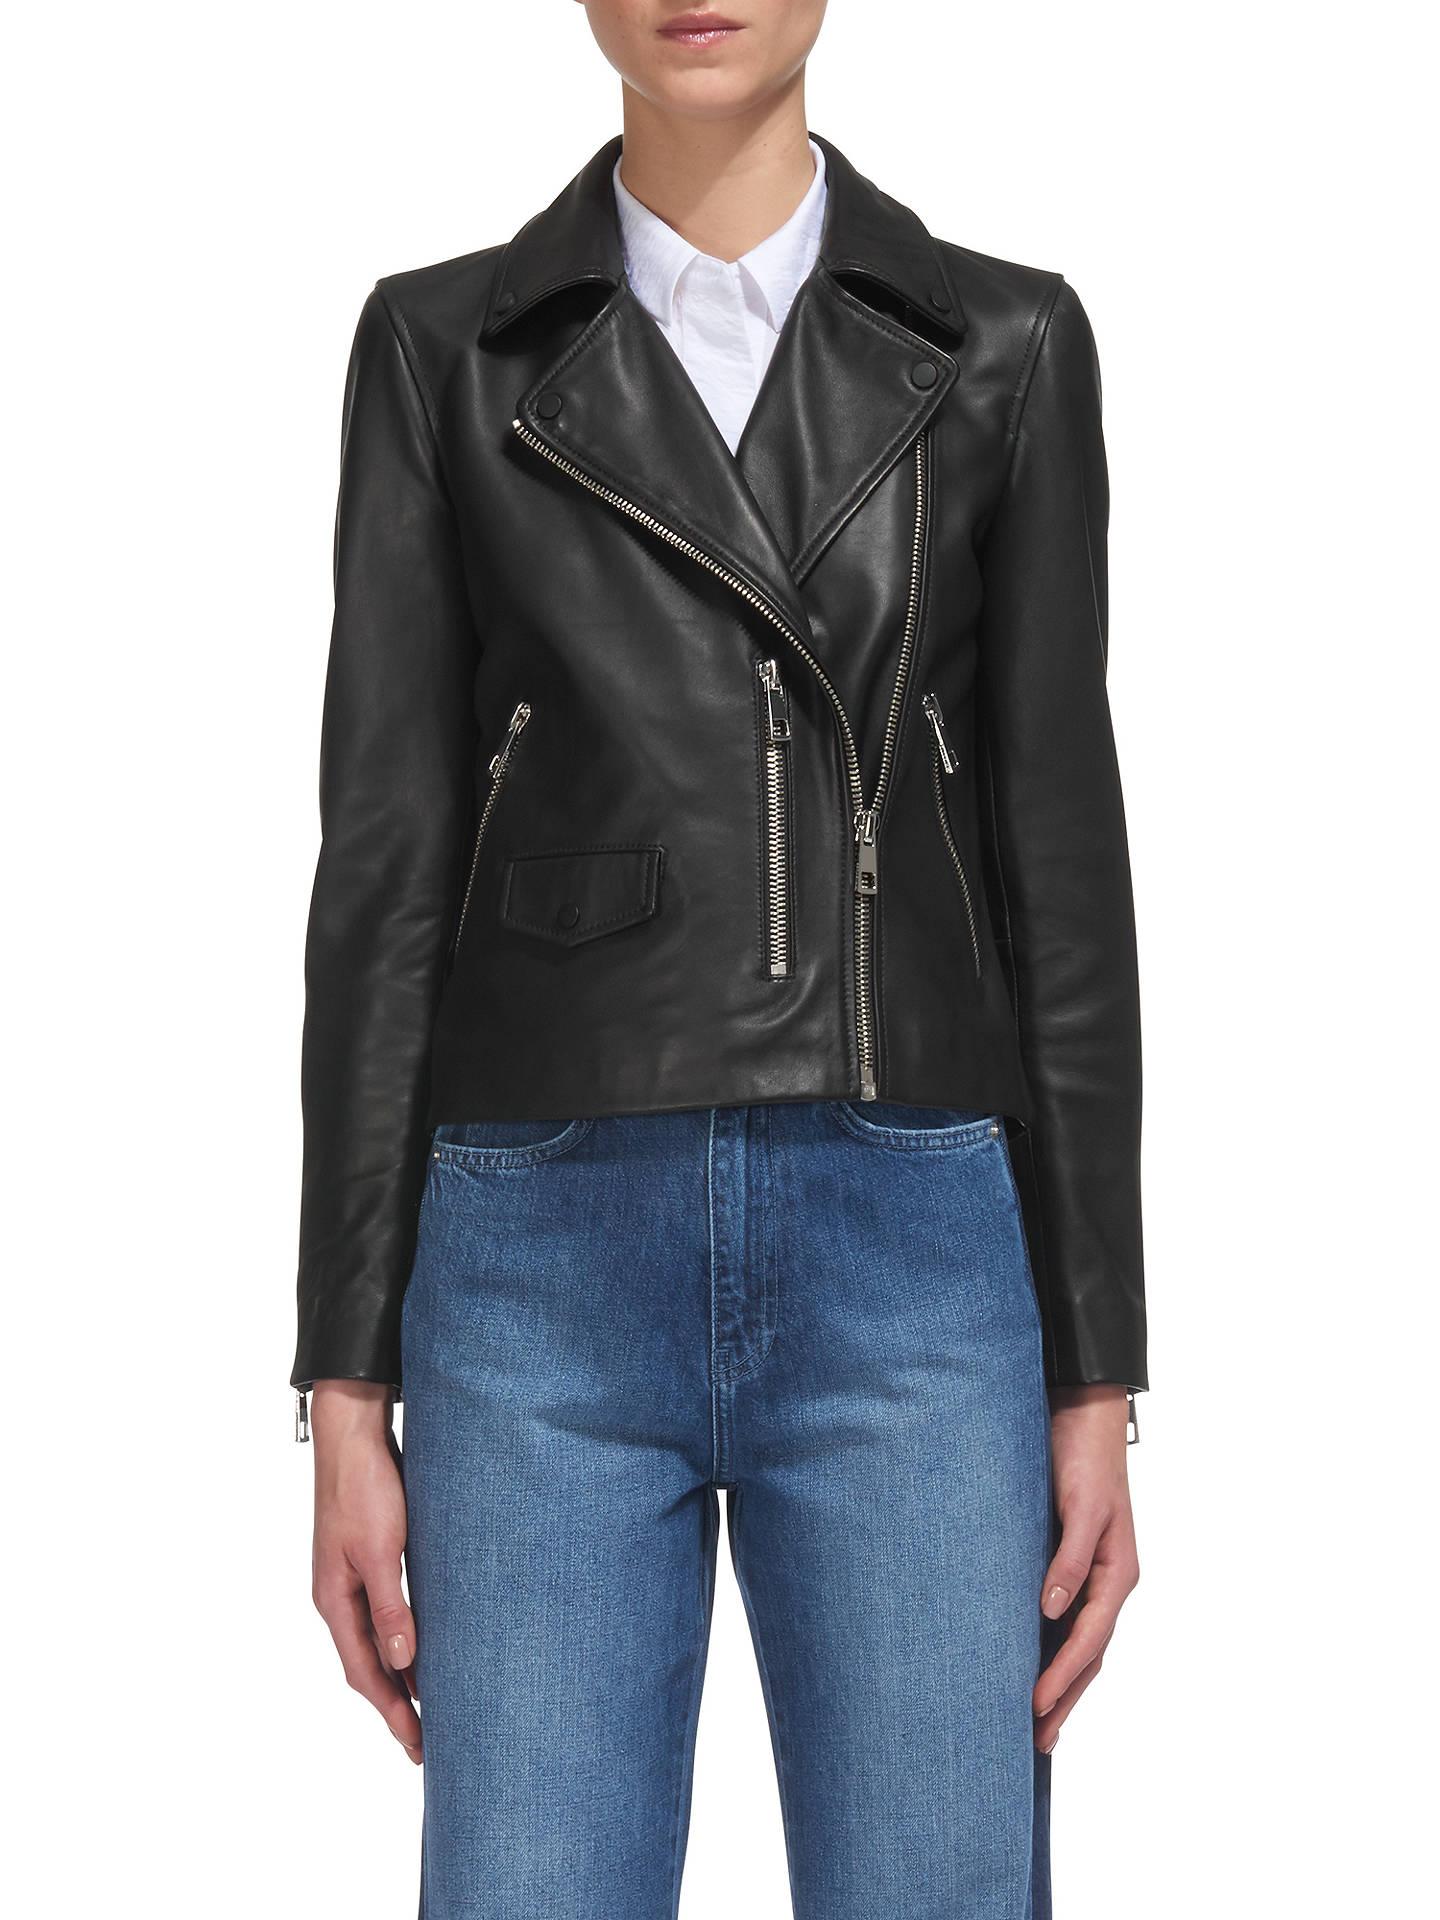 720bb1f48 Whistles Agnes Leather Biker Jacket, Black at John Lewis & Partners